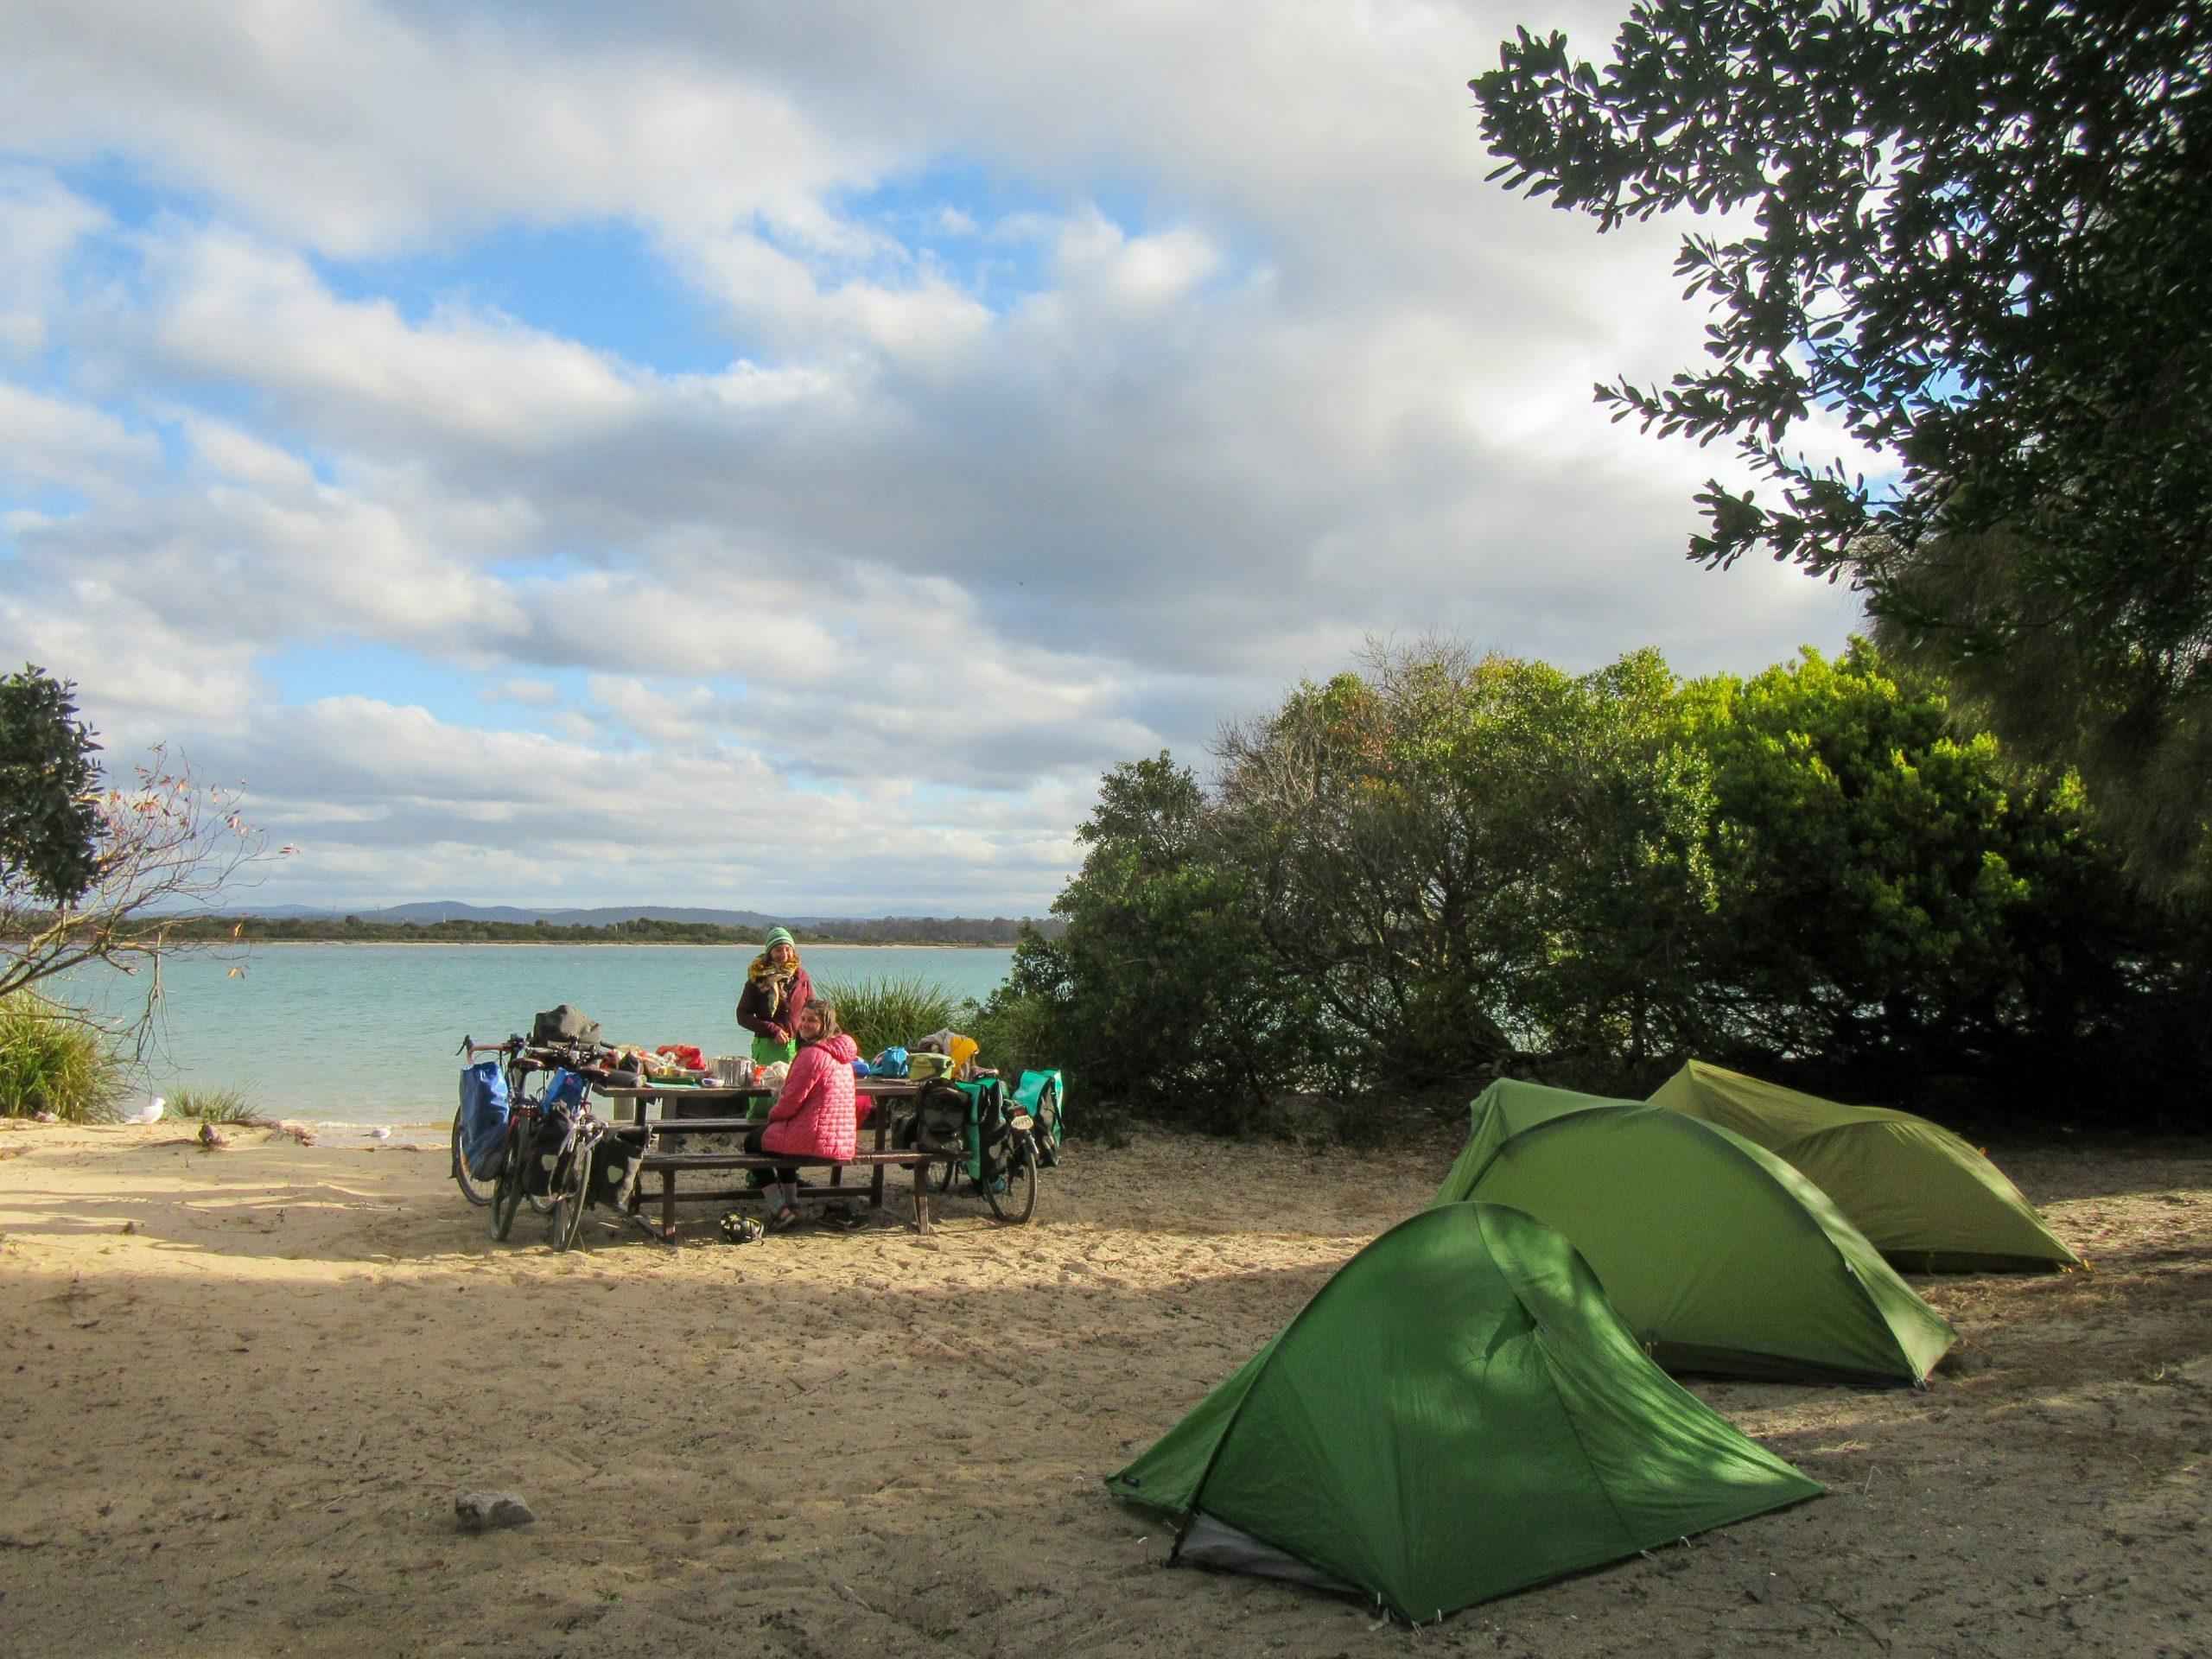 Bakers Beach camp